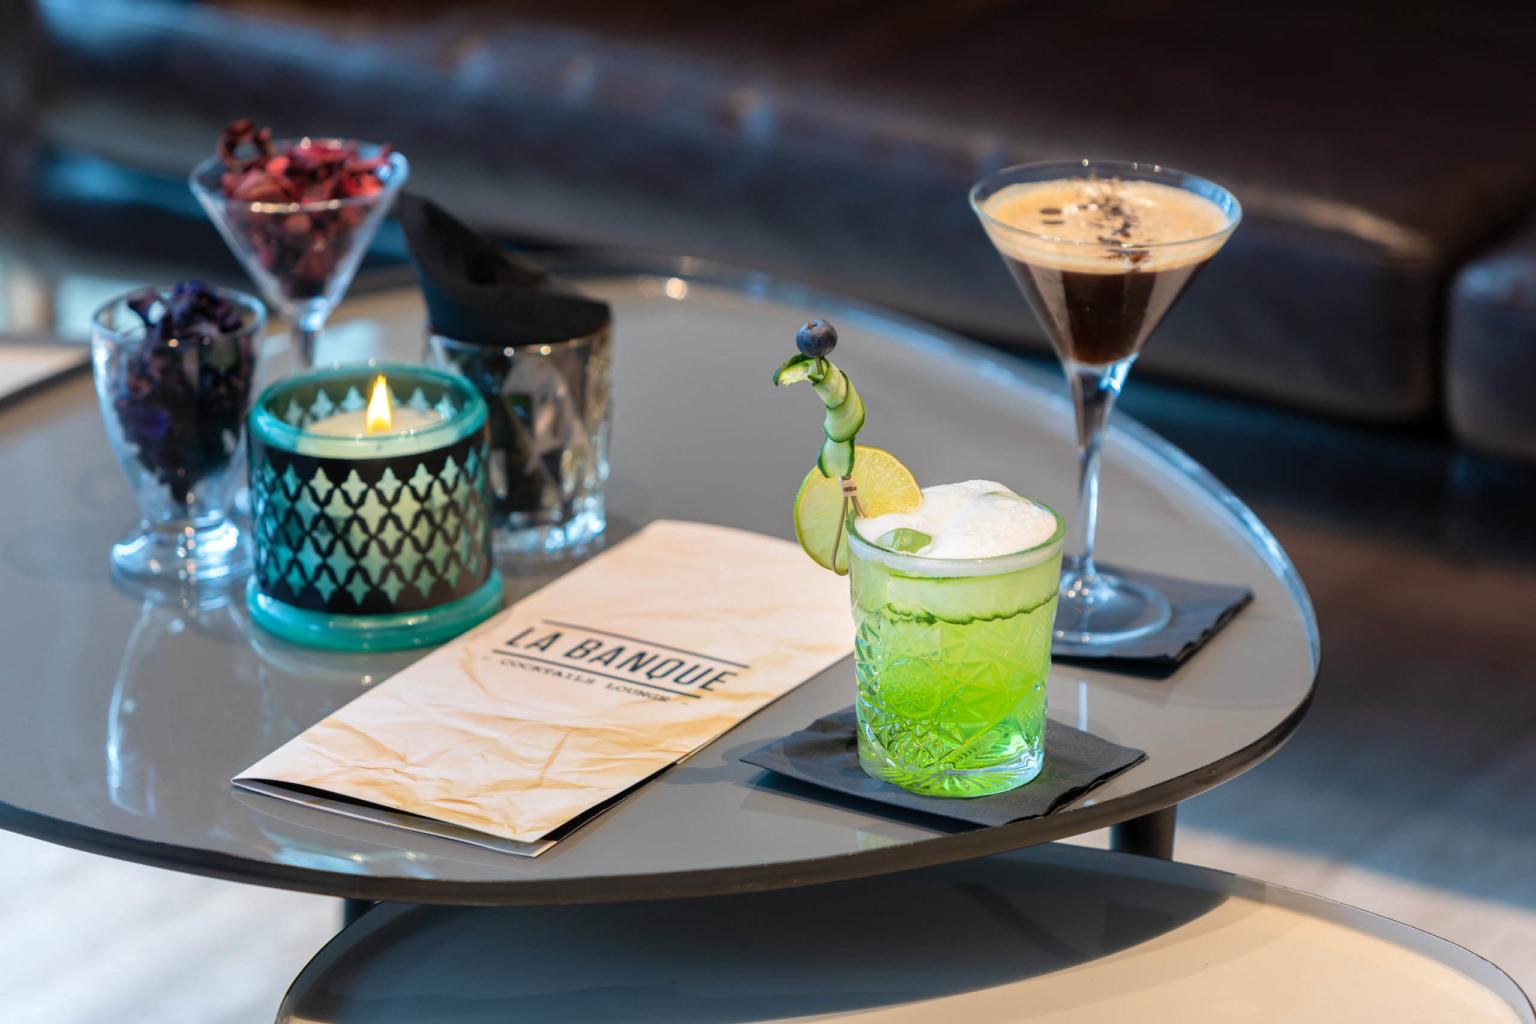 Fotografo Food Cocktail per Lounge Bar a Venezia Mestre